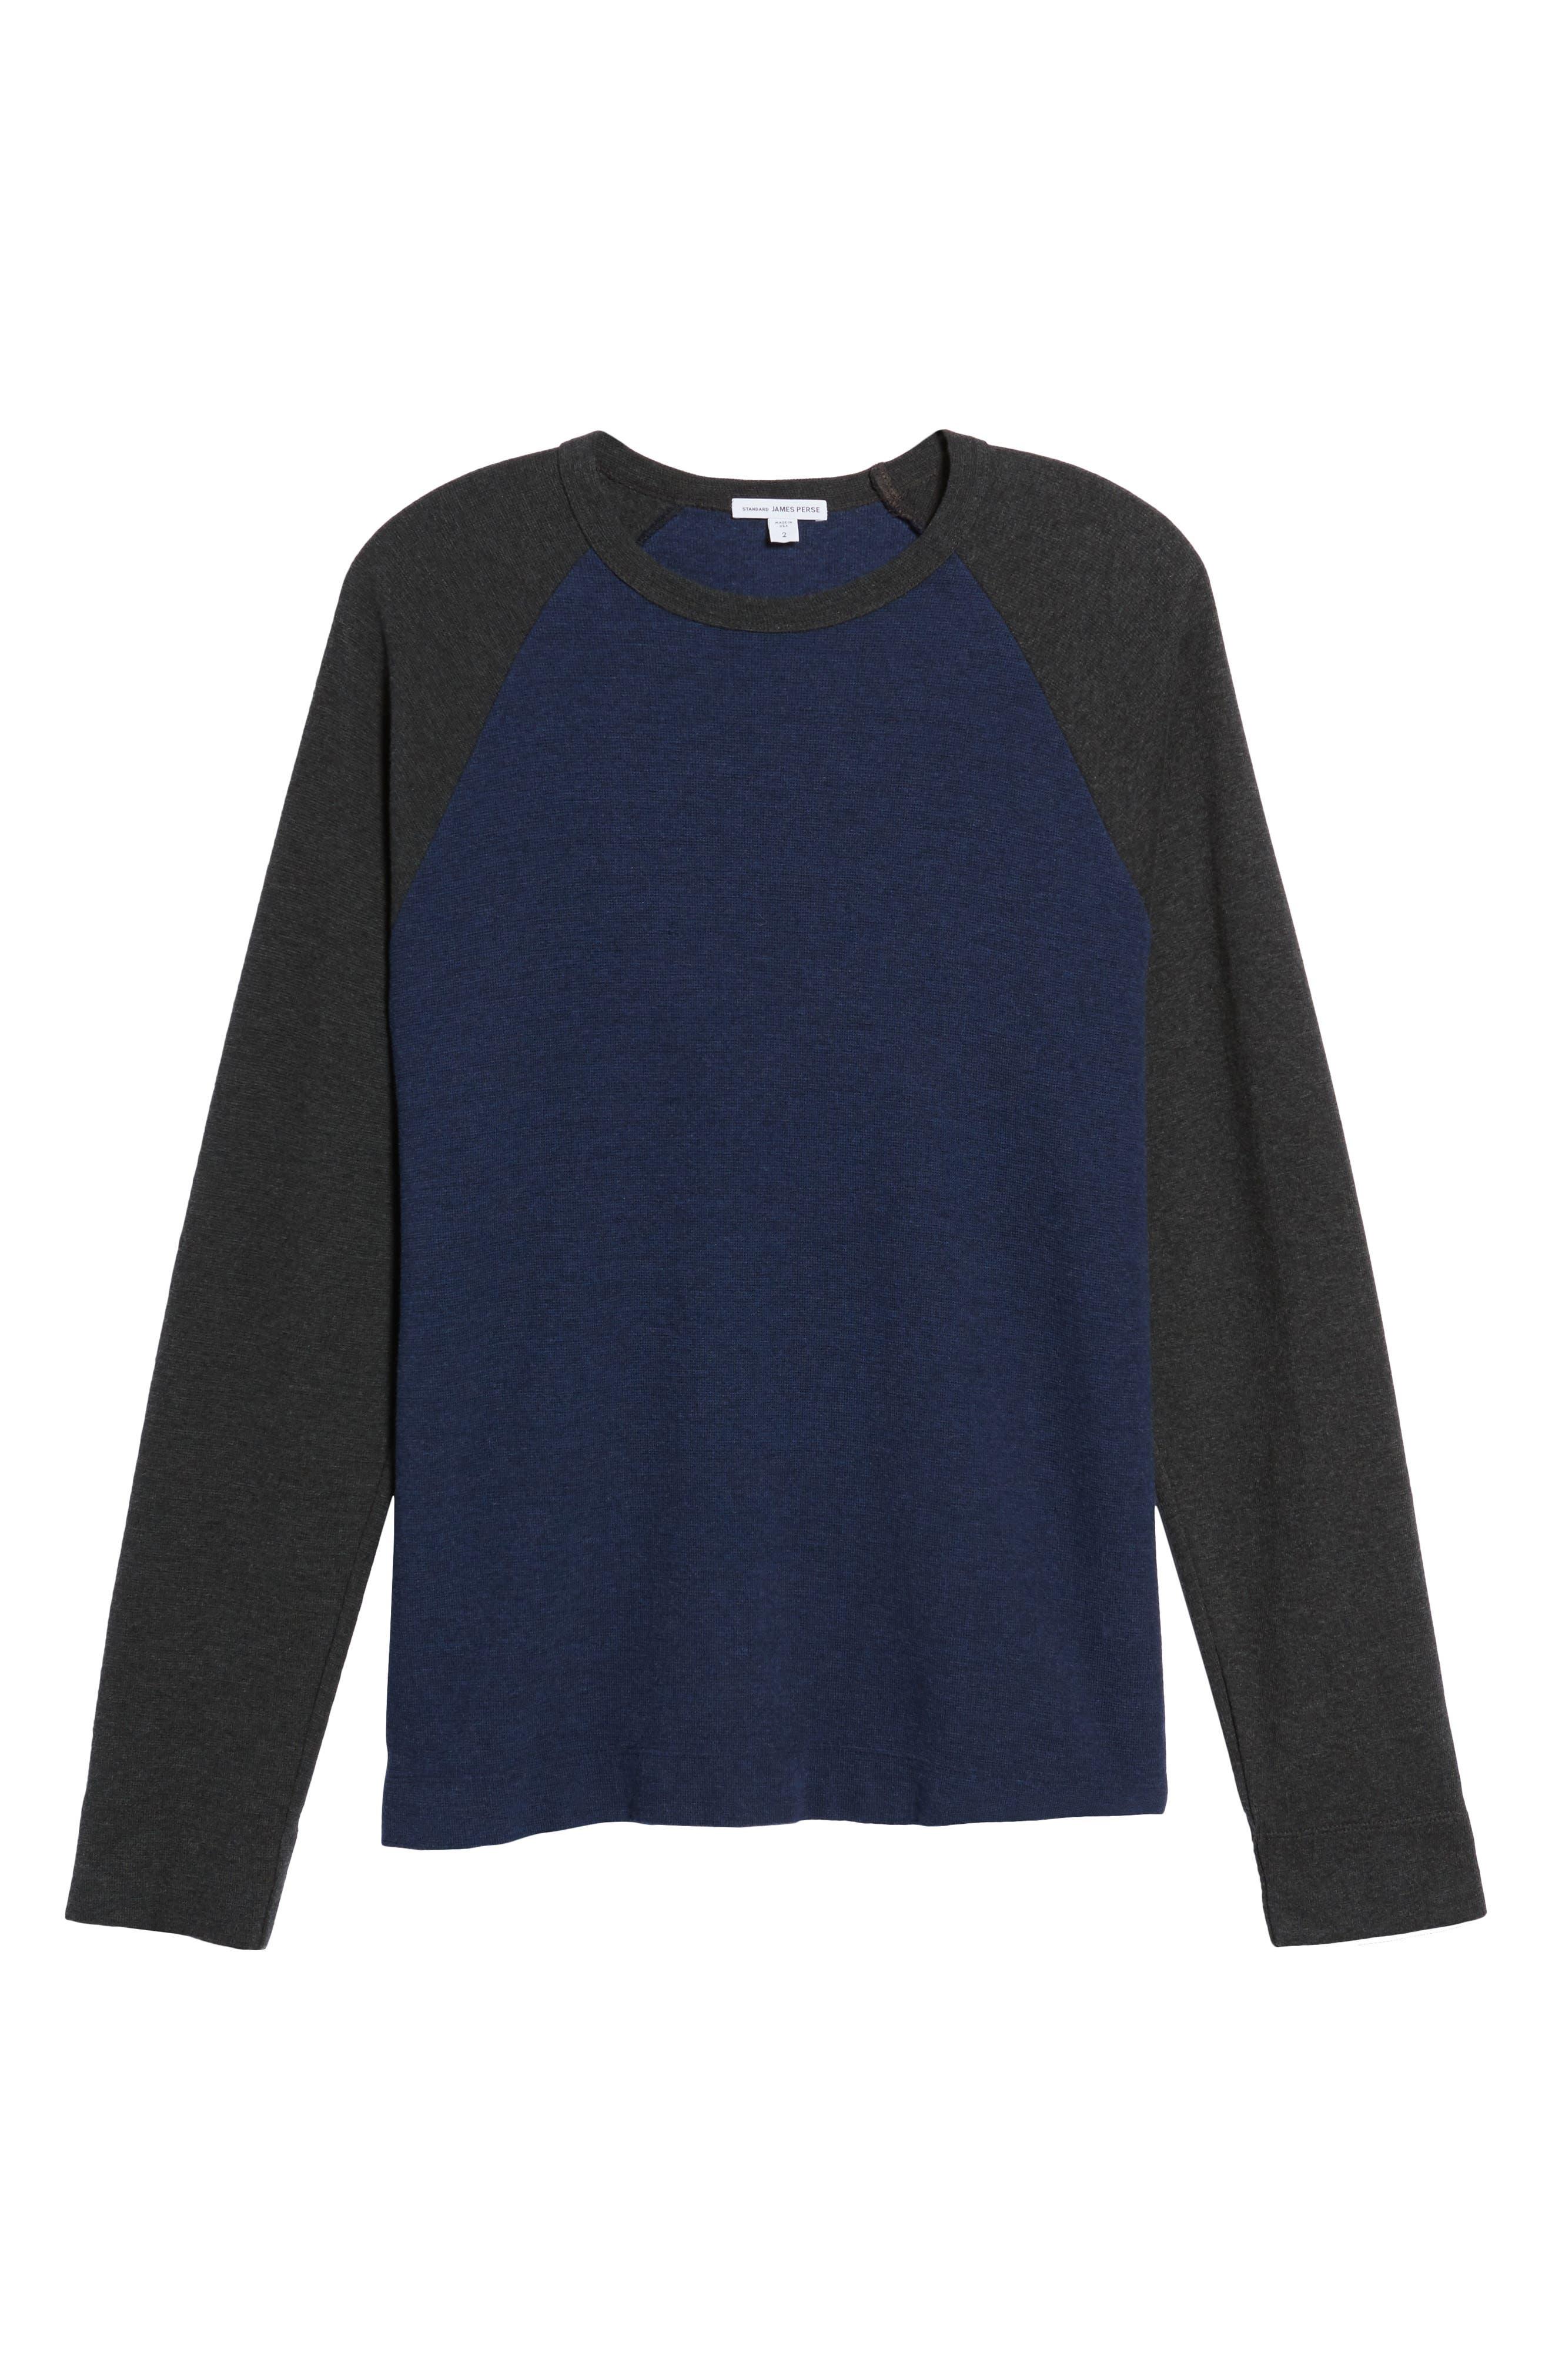 Thermal Knit Raglan Sweatshirt,                             Alternate thumbnail 6, color,                             Heather Navy/ Heather Charcoal